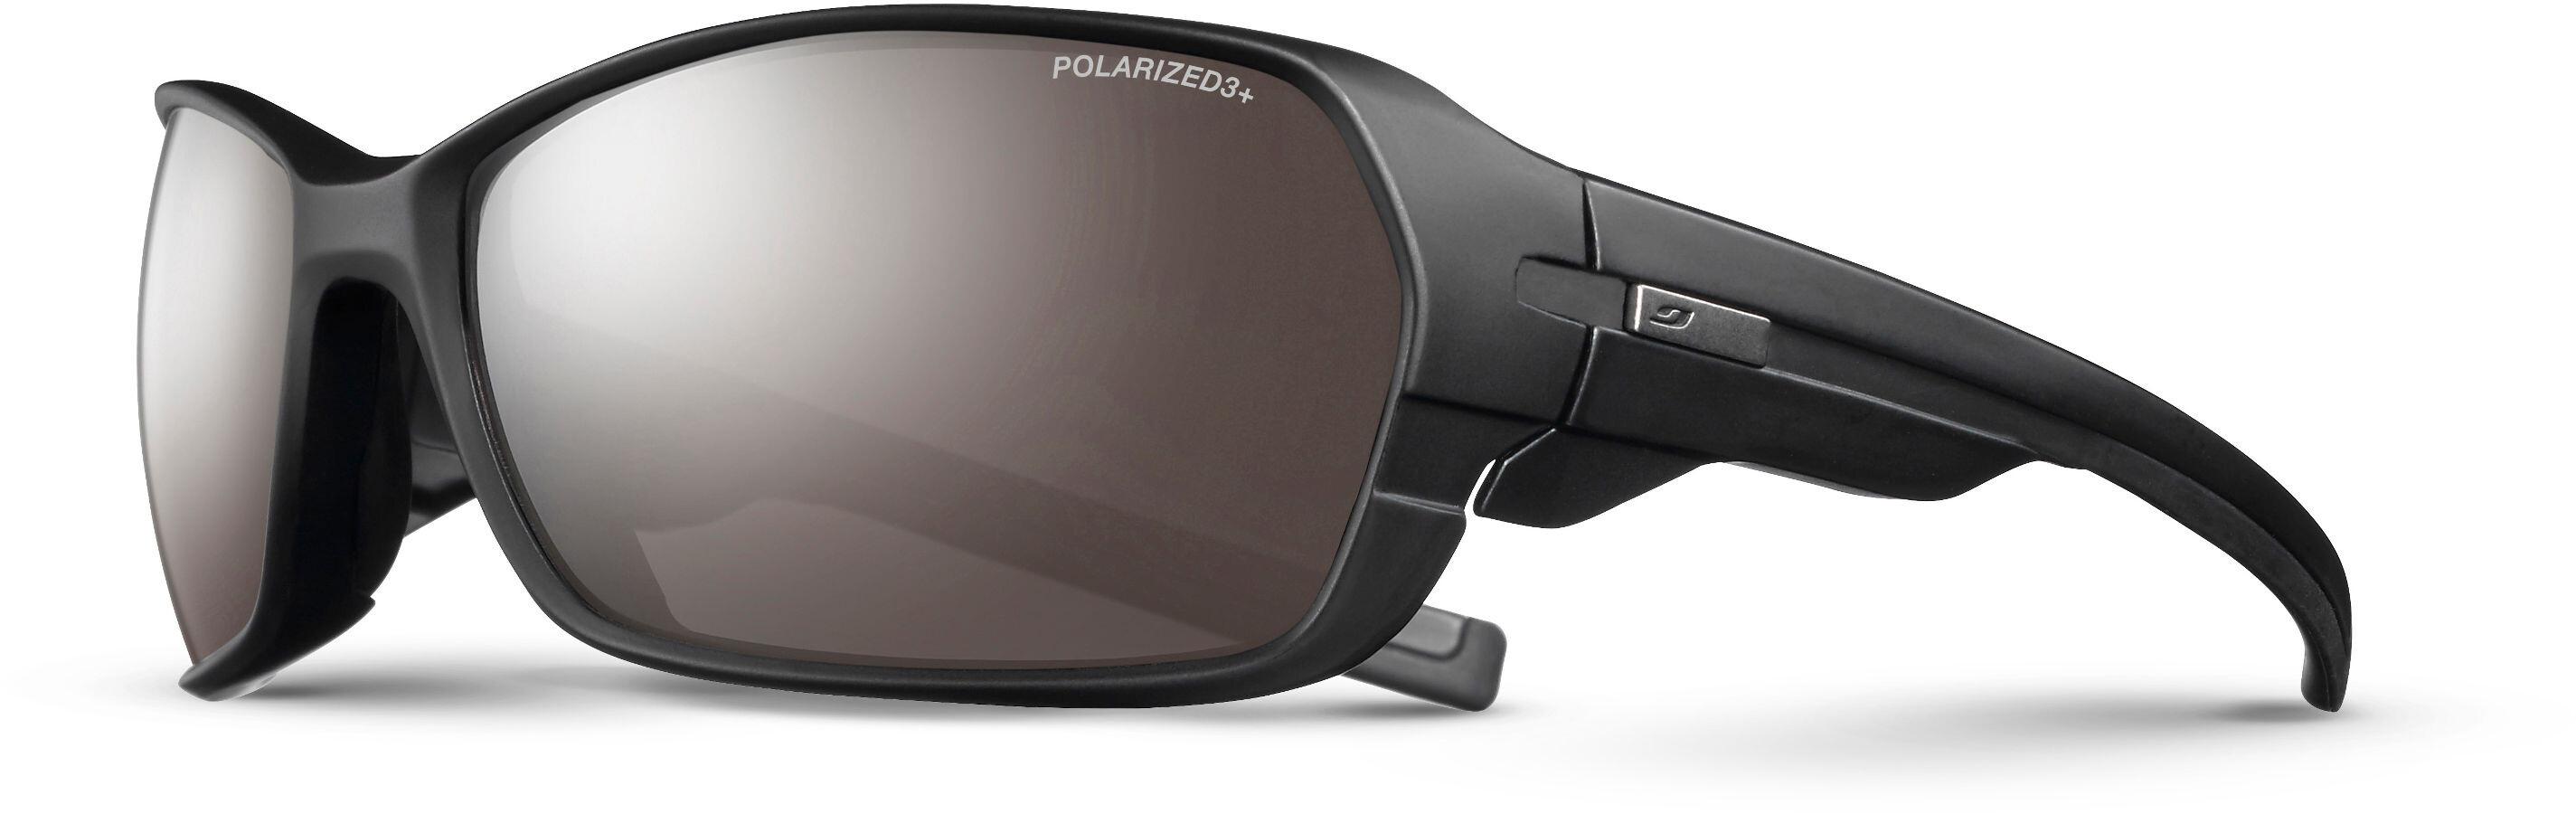 b0f00a44e3 Julbo Dirt² Polarized 3+ Glasses grey at Bikester.co.uk